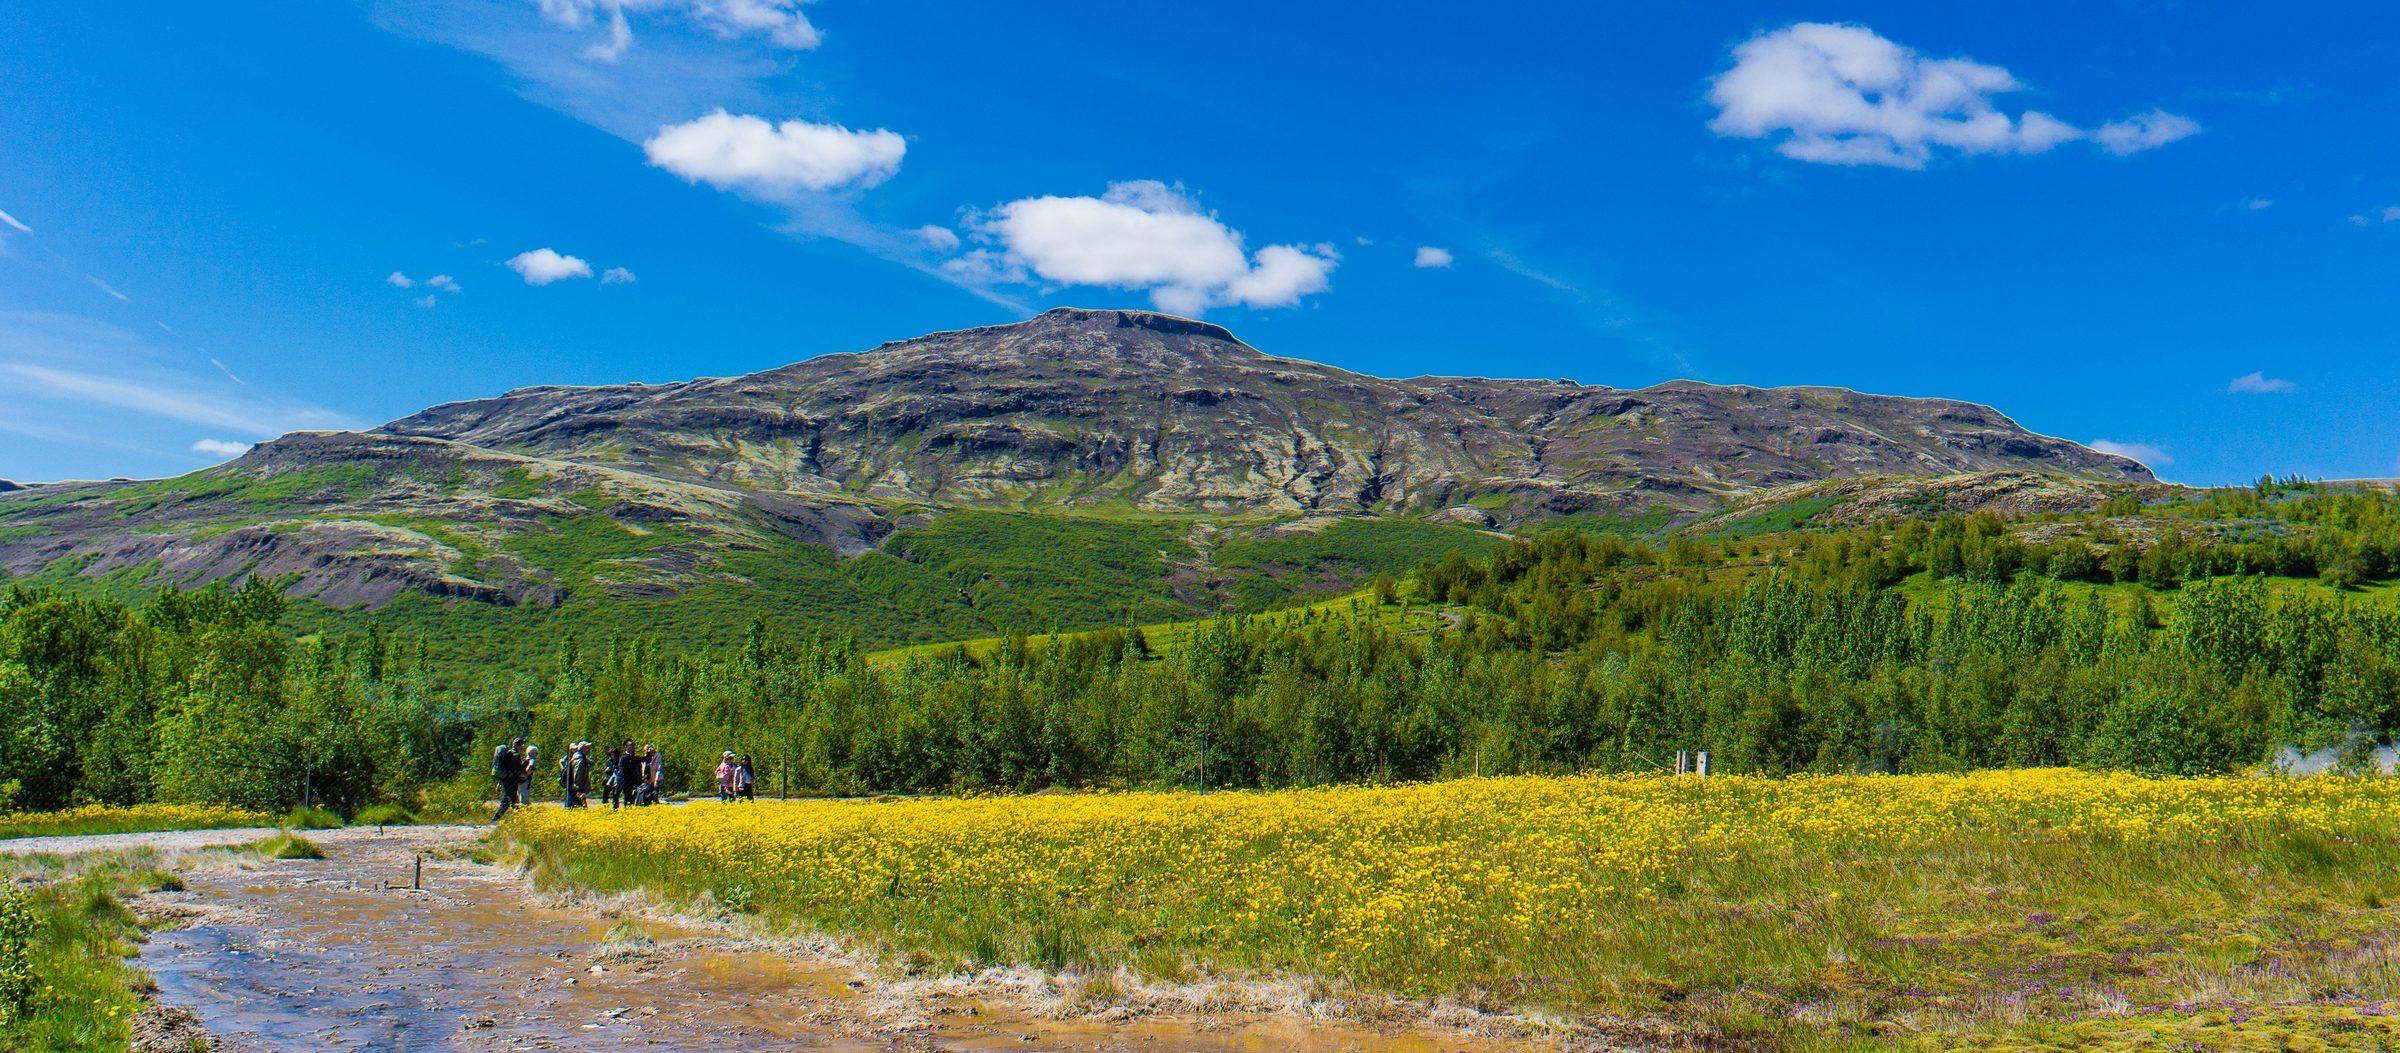 Rowerem przez Islandię. Droga z Laugarvatn do Hveravellir. Wjazd na Kjölur